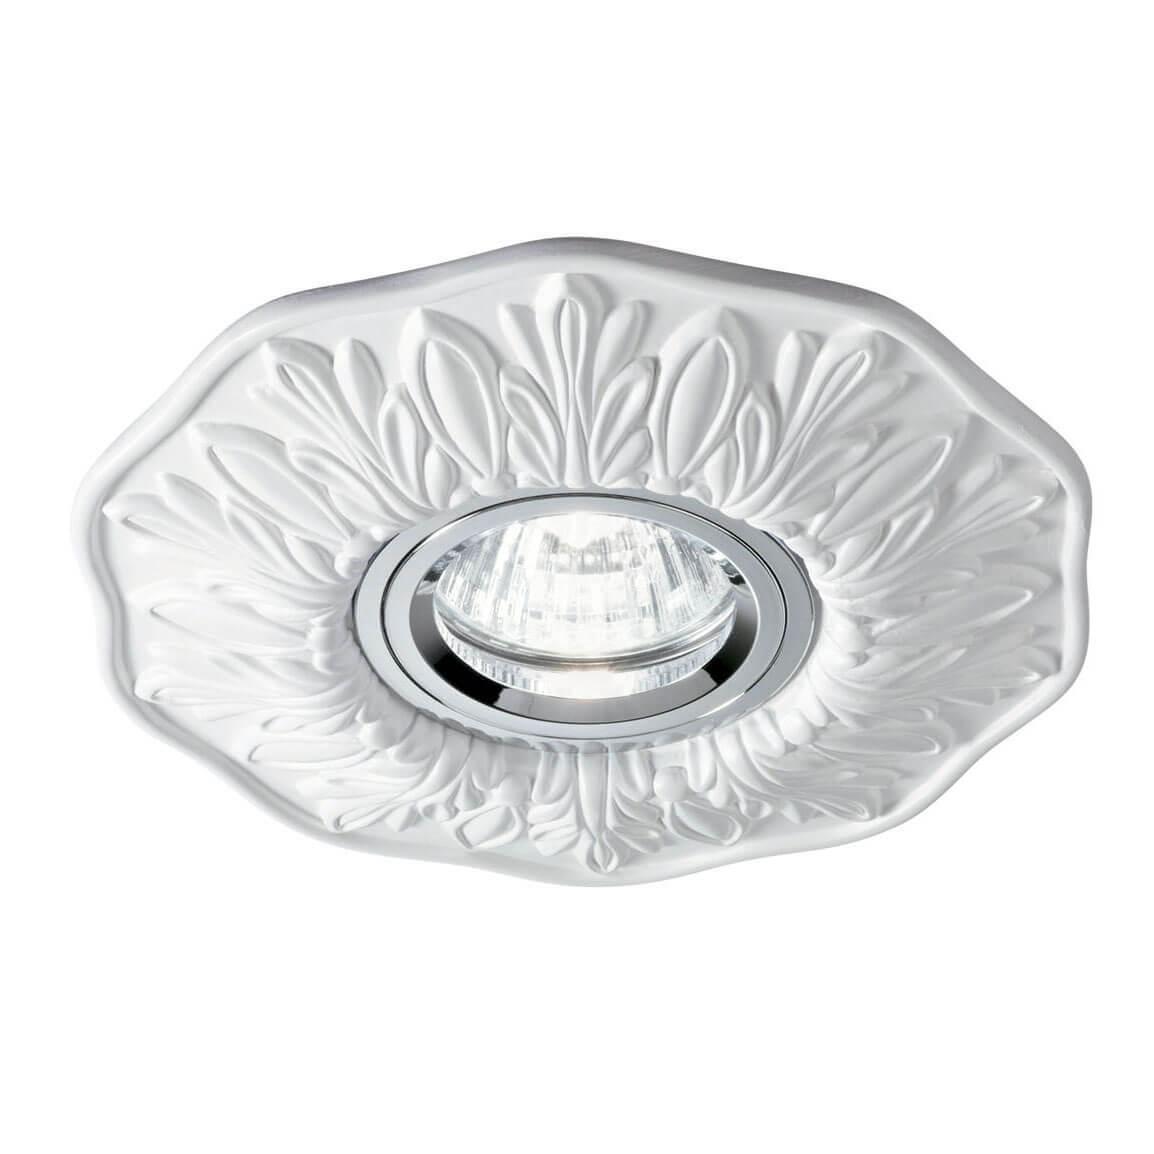 Светильник Ideal Lux Polka FI1 Bianco